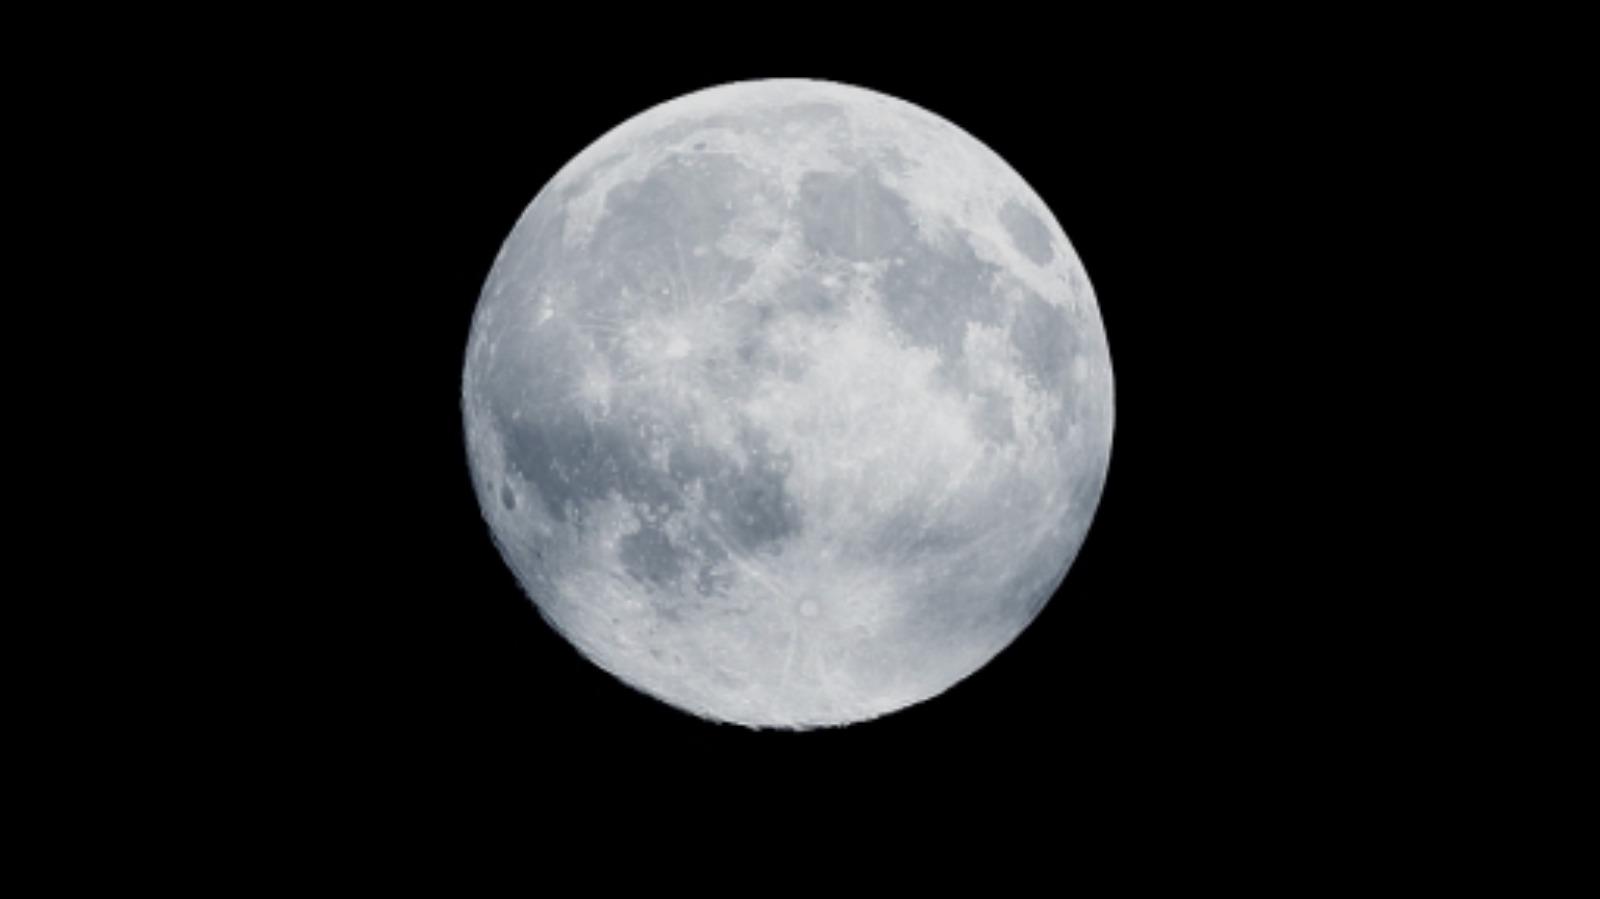 'Blood moon' brings prophecies of end times – but Nasa ...